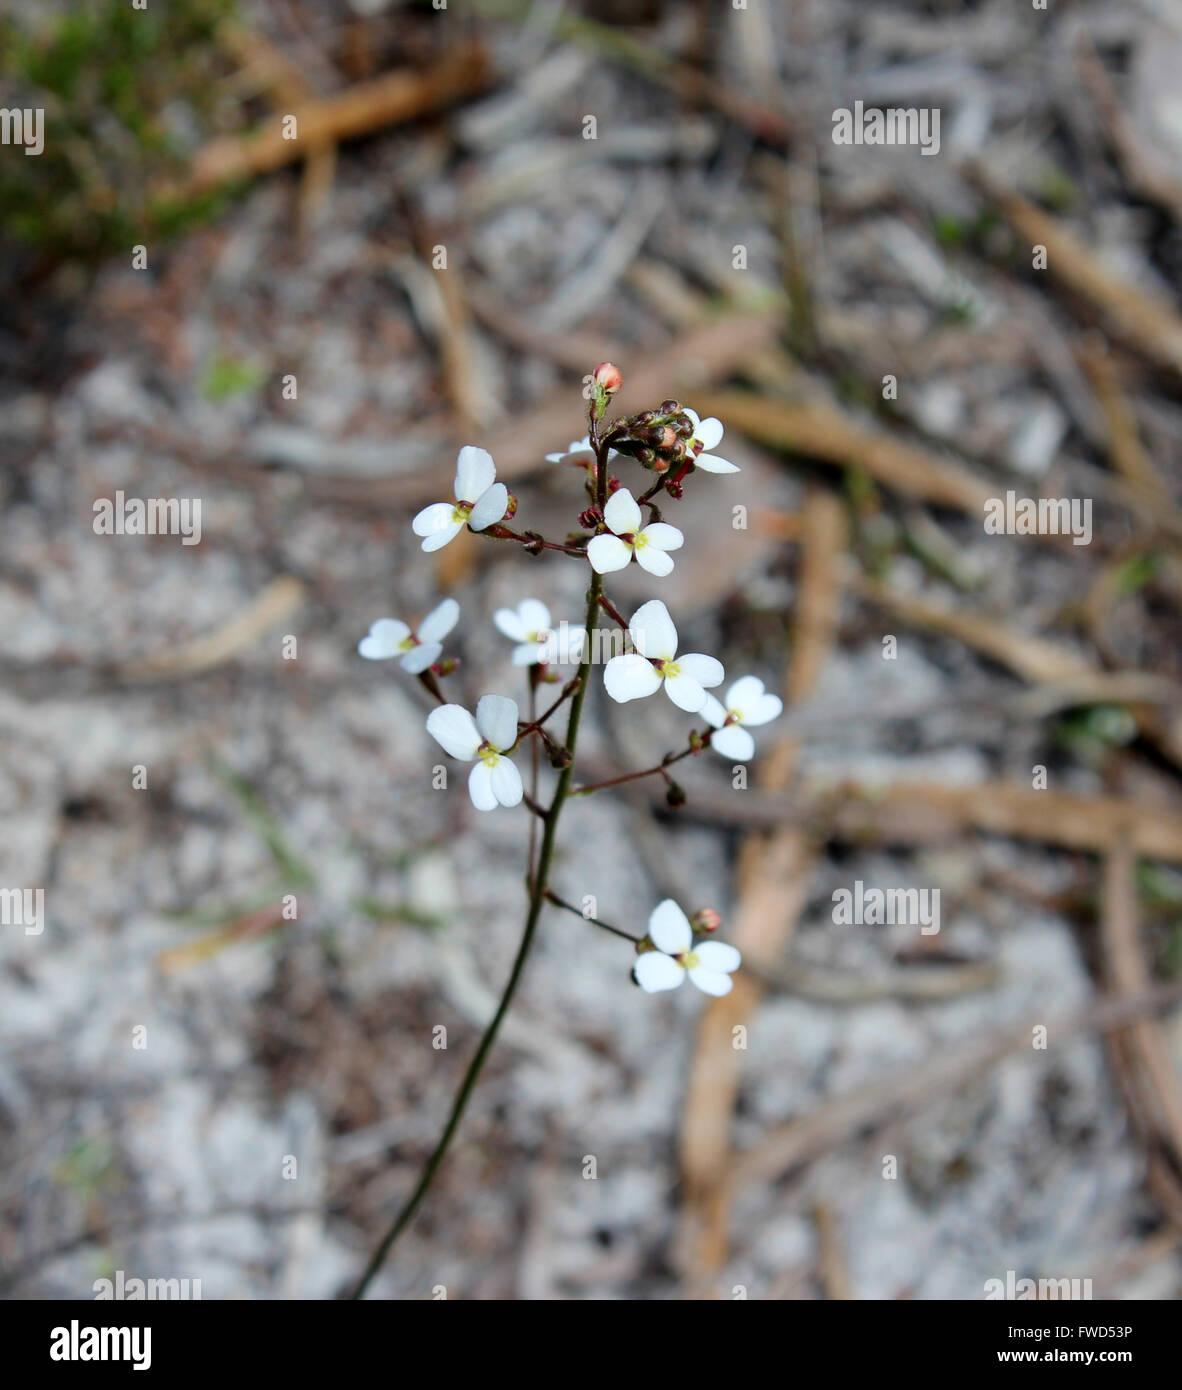 White flowers of  Western Australian wildflower Stylidium  trigger plants  growing in woodland  flowering in spring - Stock Image